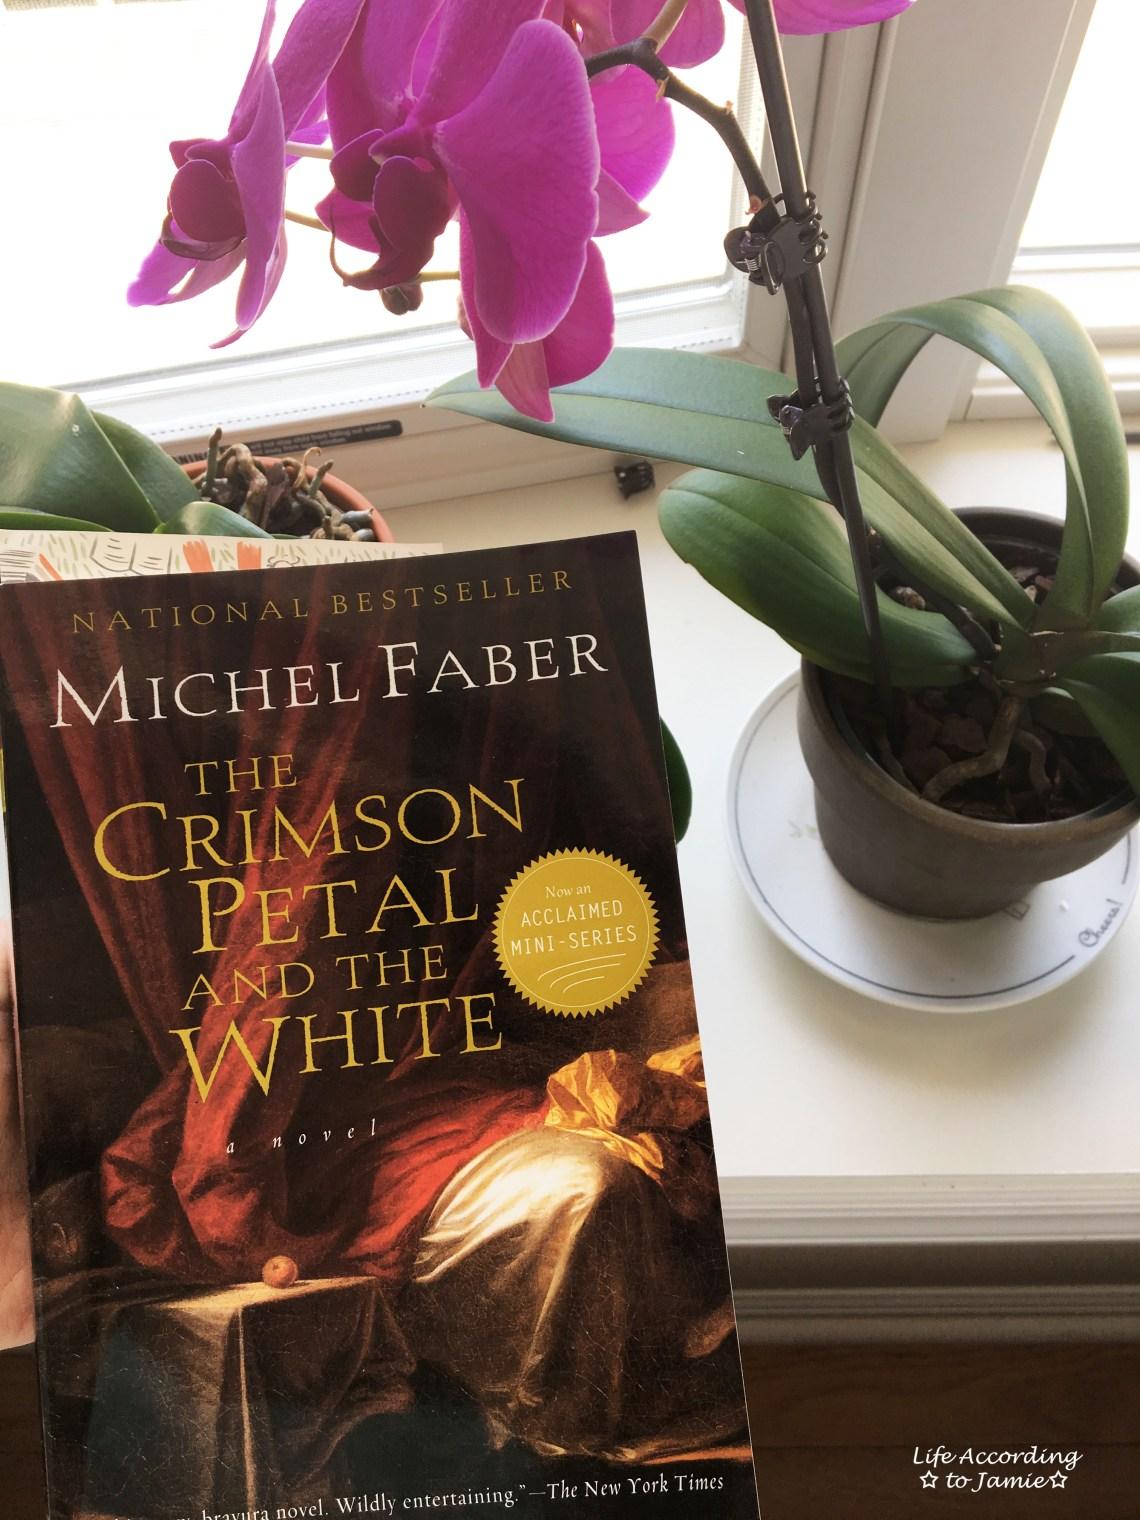 The Crimson Petal & the White